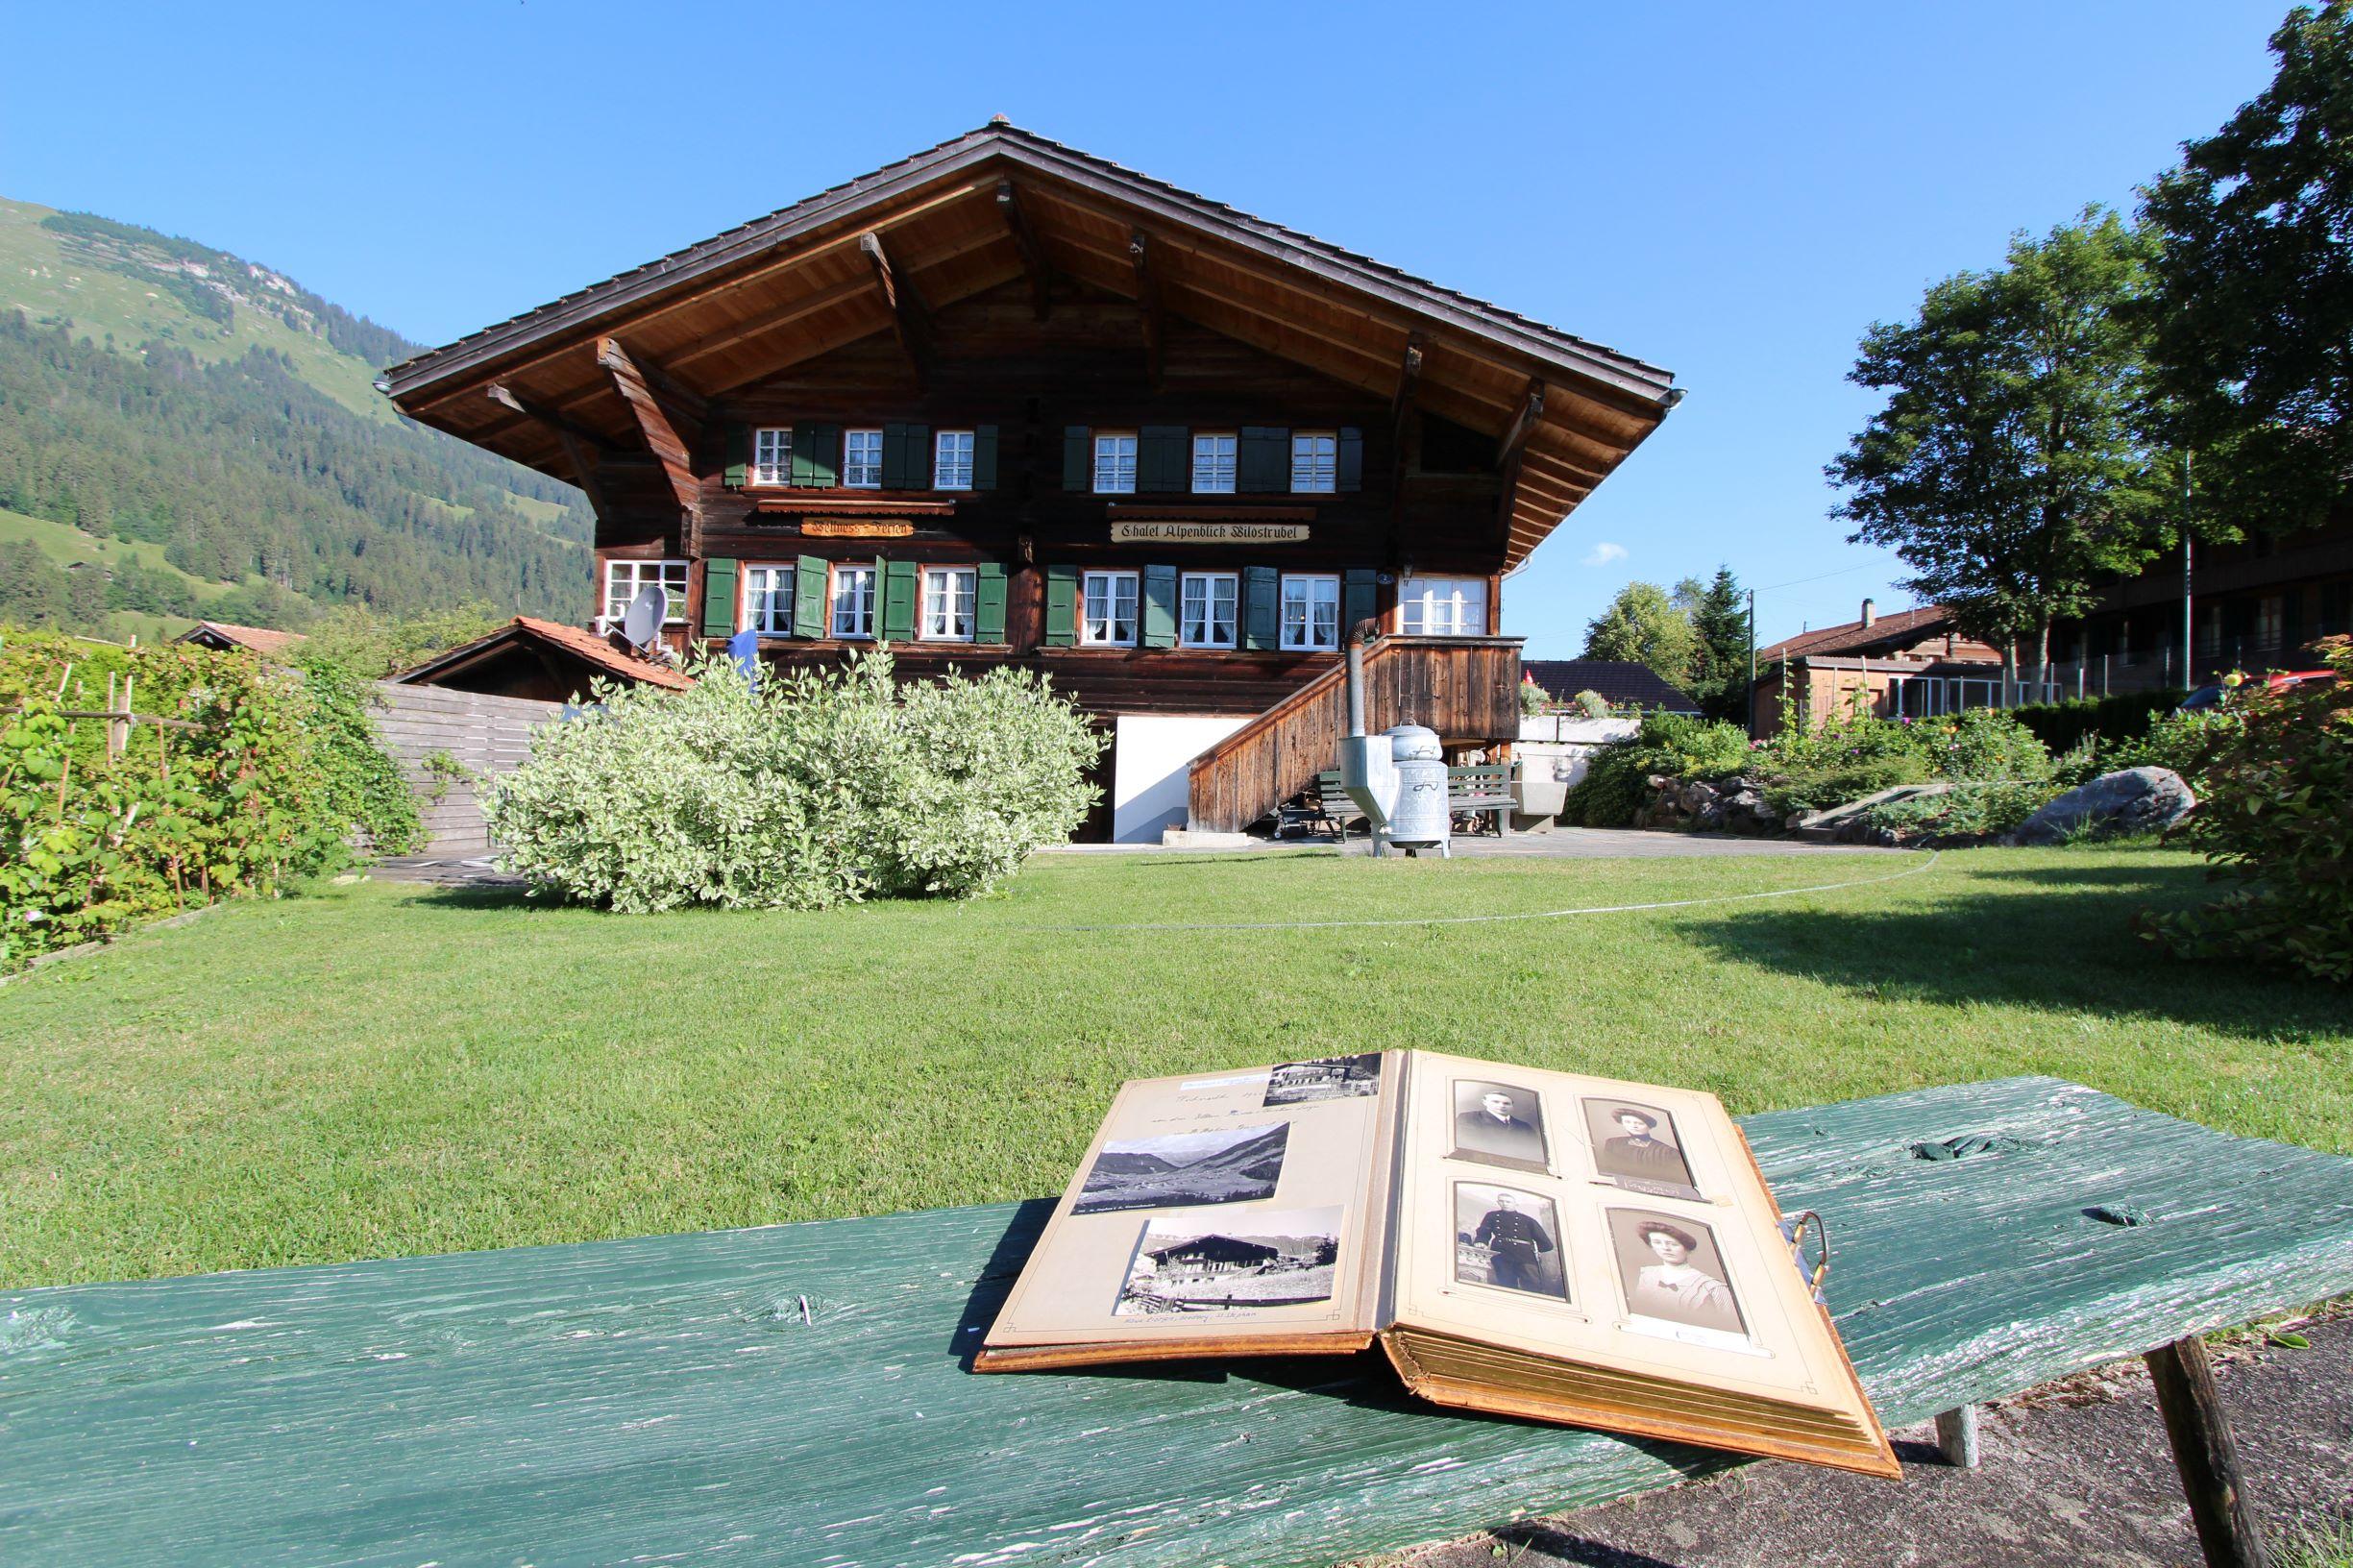 Chalet-Hotel Alpenblick Wildstrubel 1